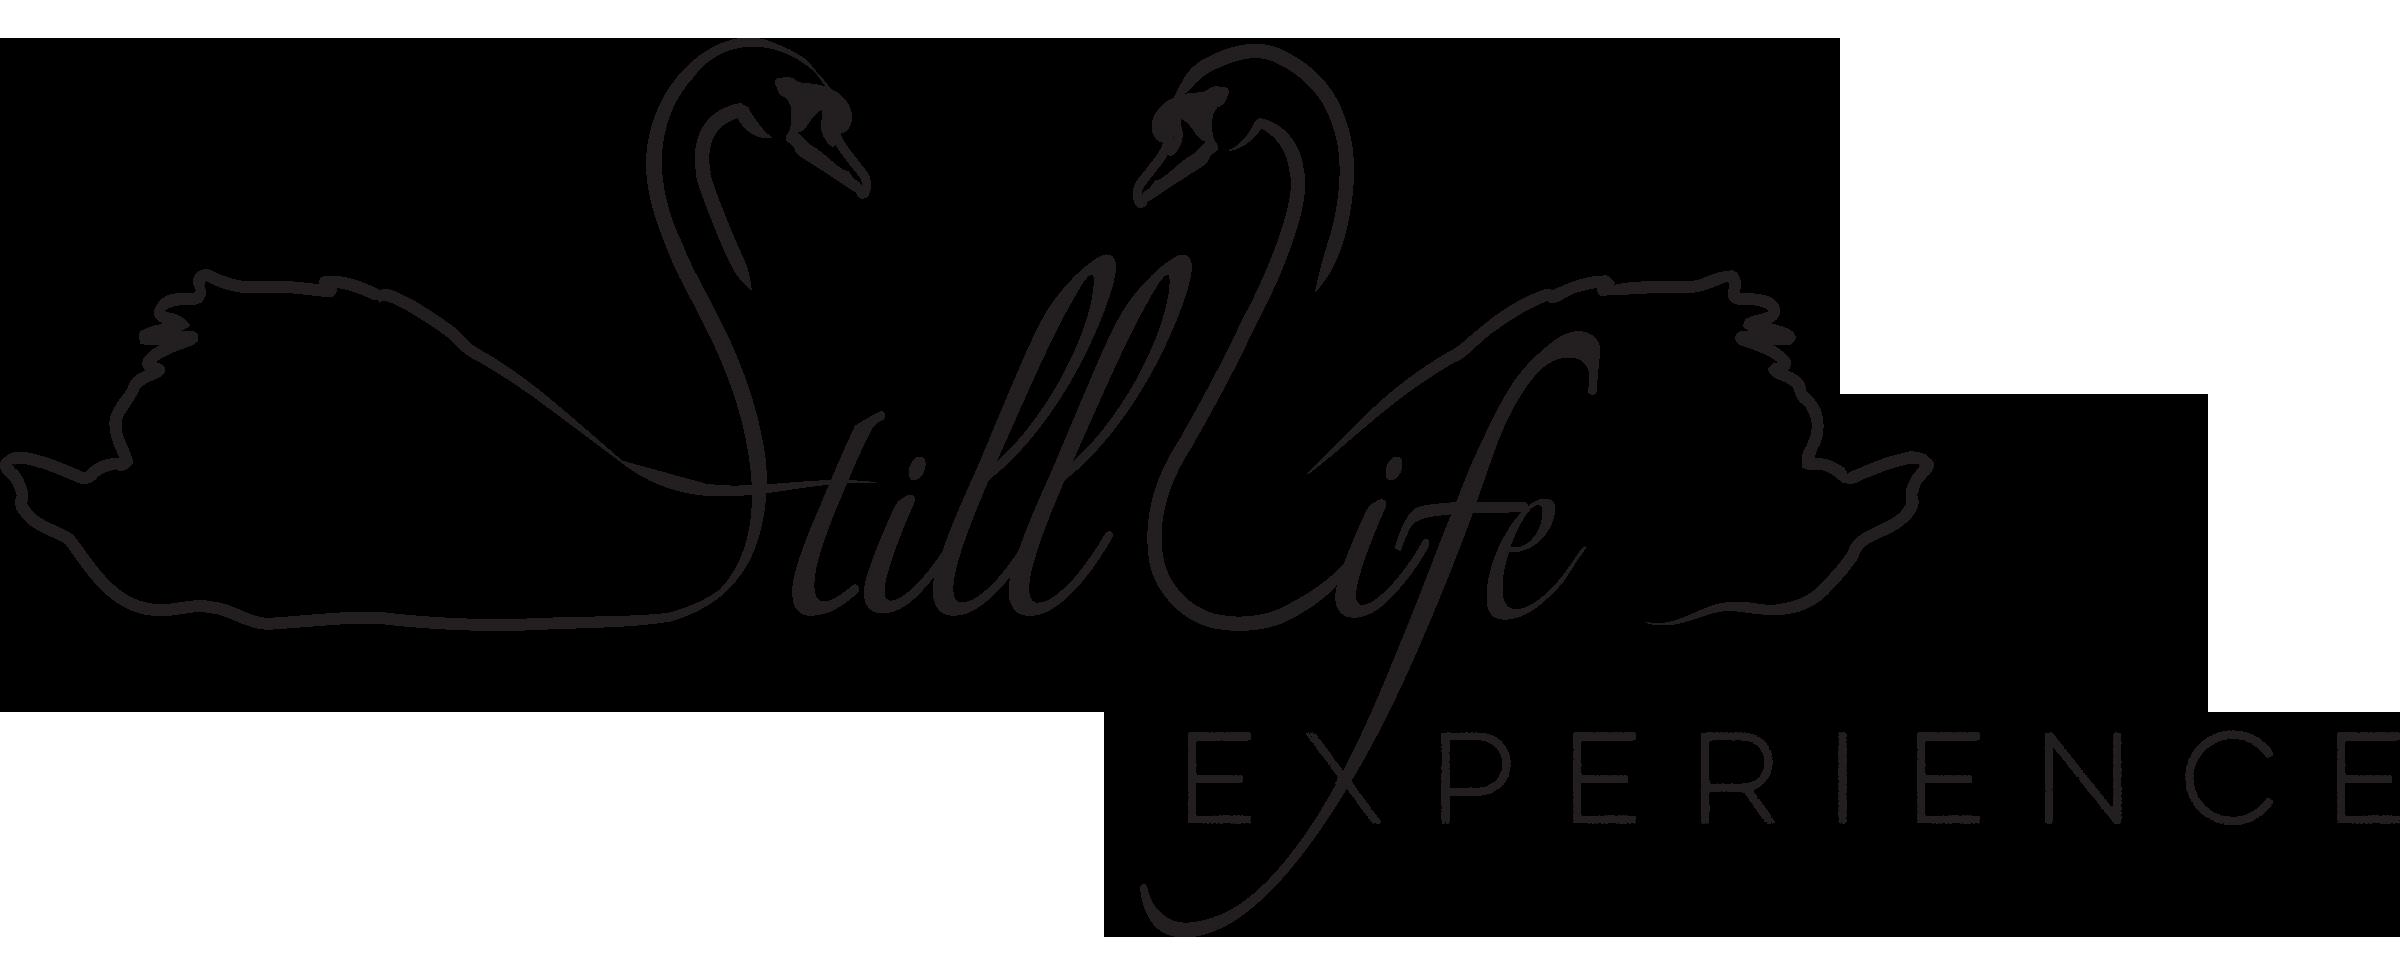 Still_Life_Logo_Experience (1).png